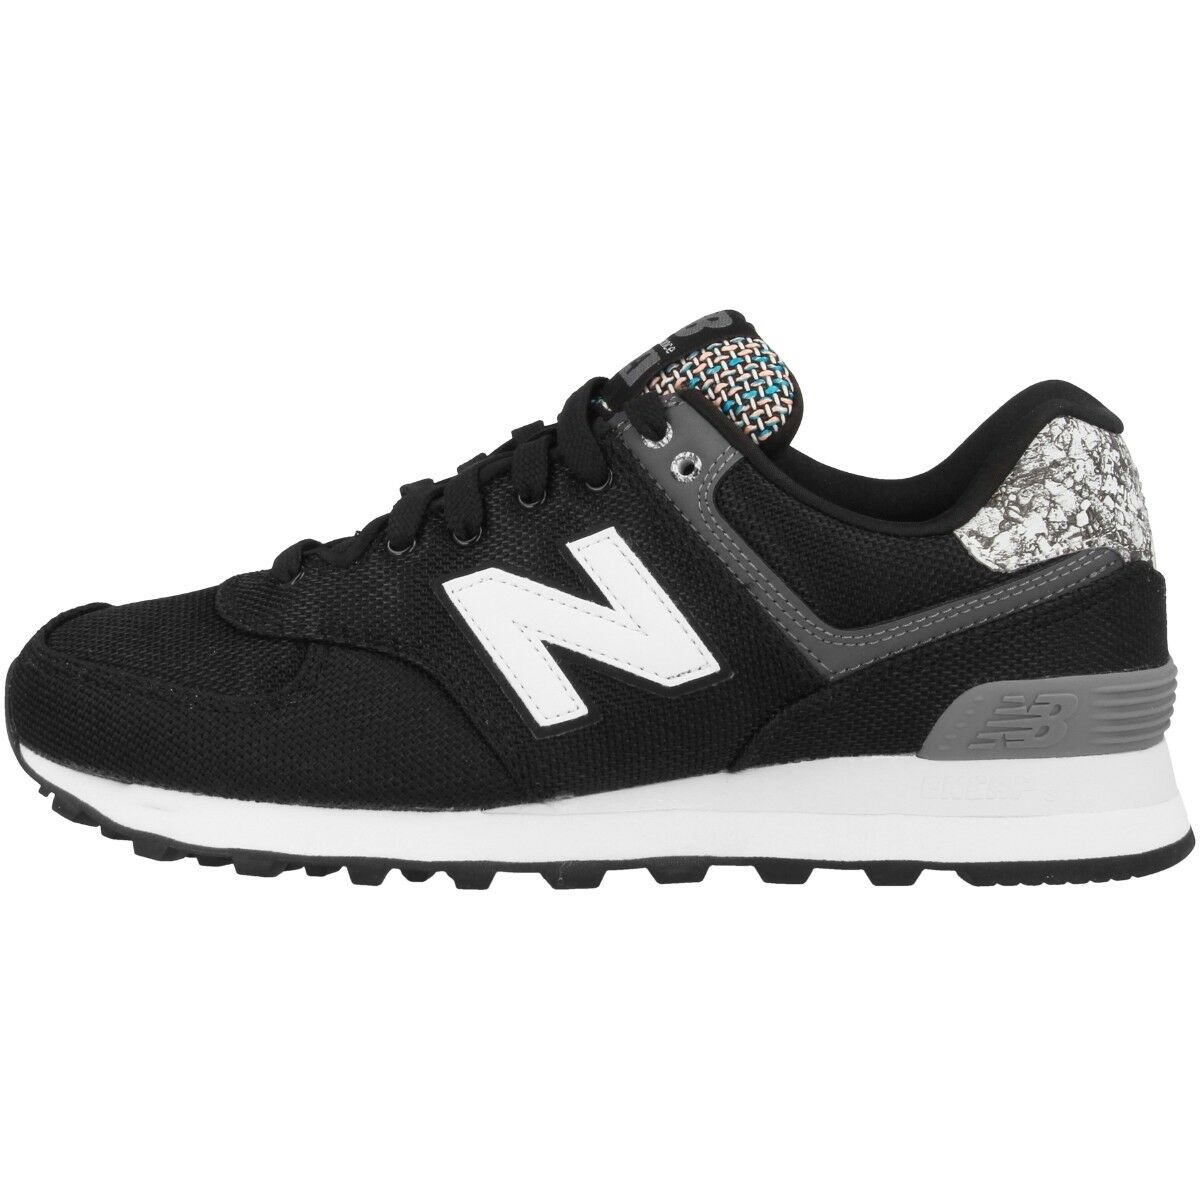 New Balance WL 574 ASB Damens Schuhe silver mink schwarz WL574ASB Damen Sneaker 373